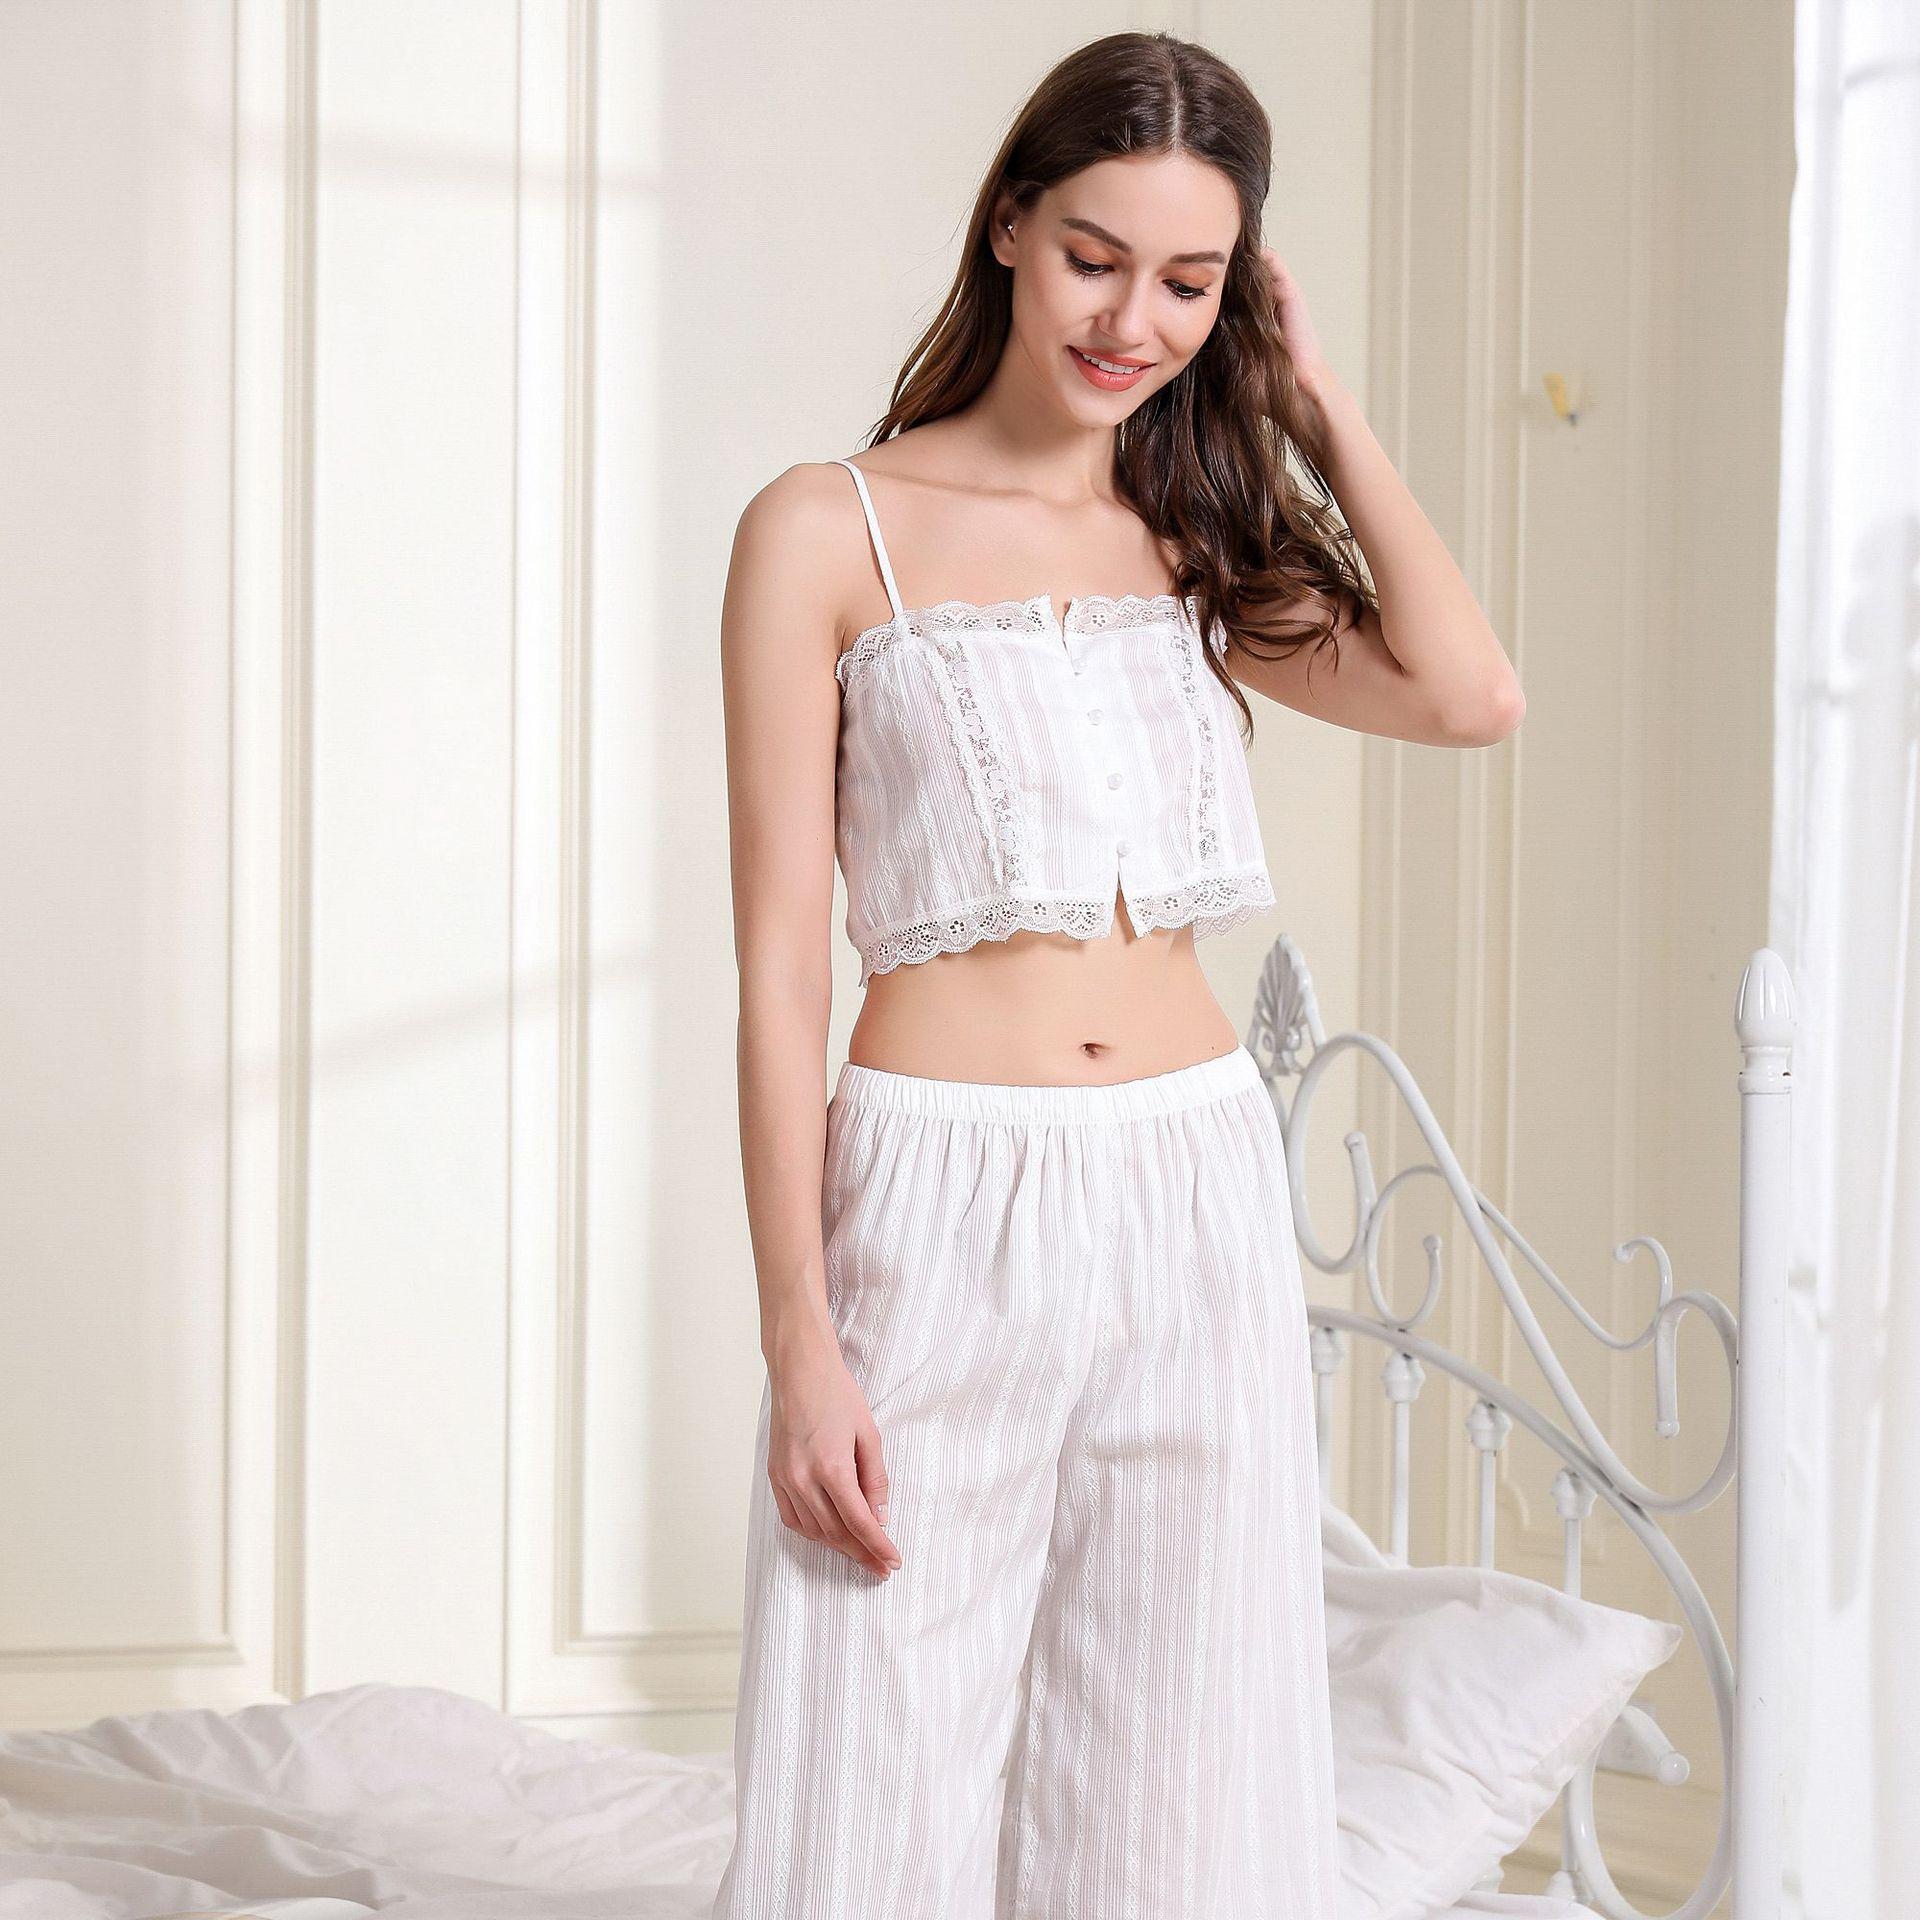 White Women/'s Nightwear Shorts Super Soft High Waist Lace Hem Hot Pants